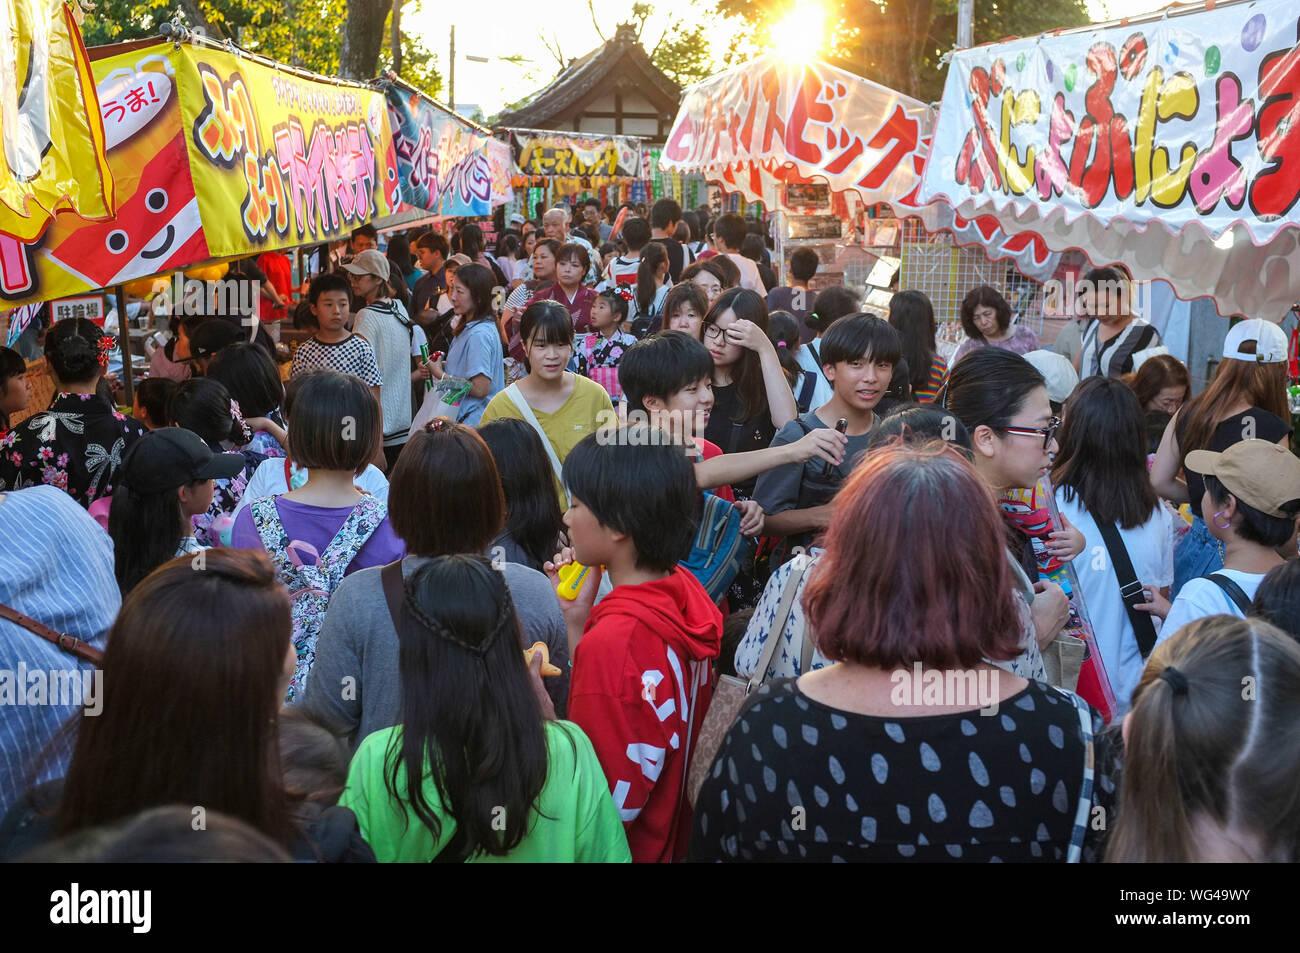 crowd-at-the-natsu-matsuri-summer-festif